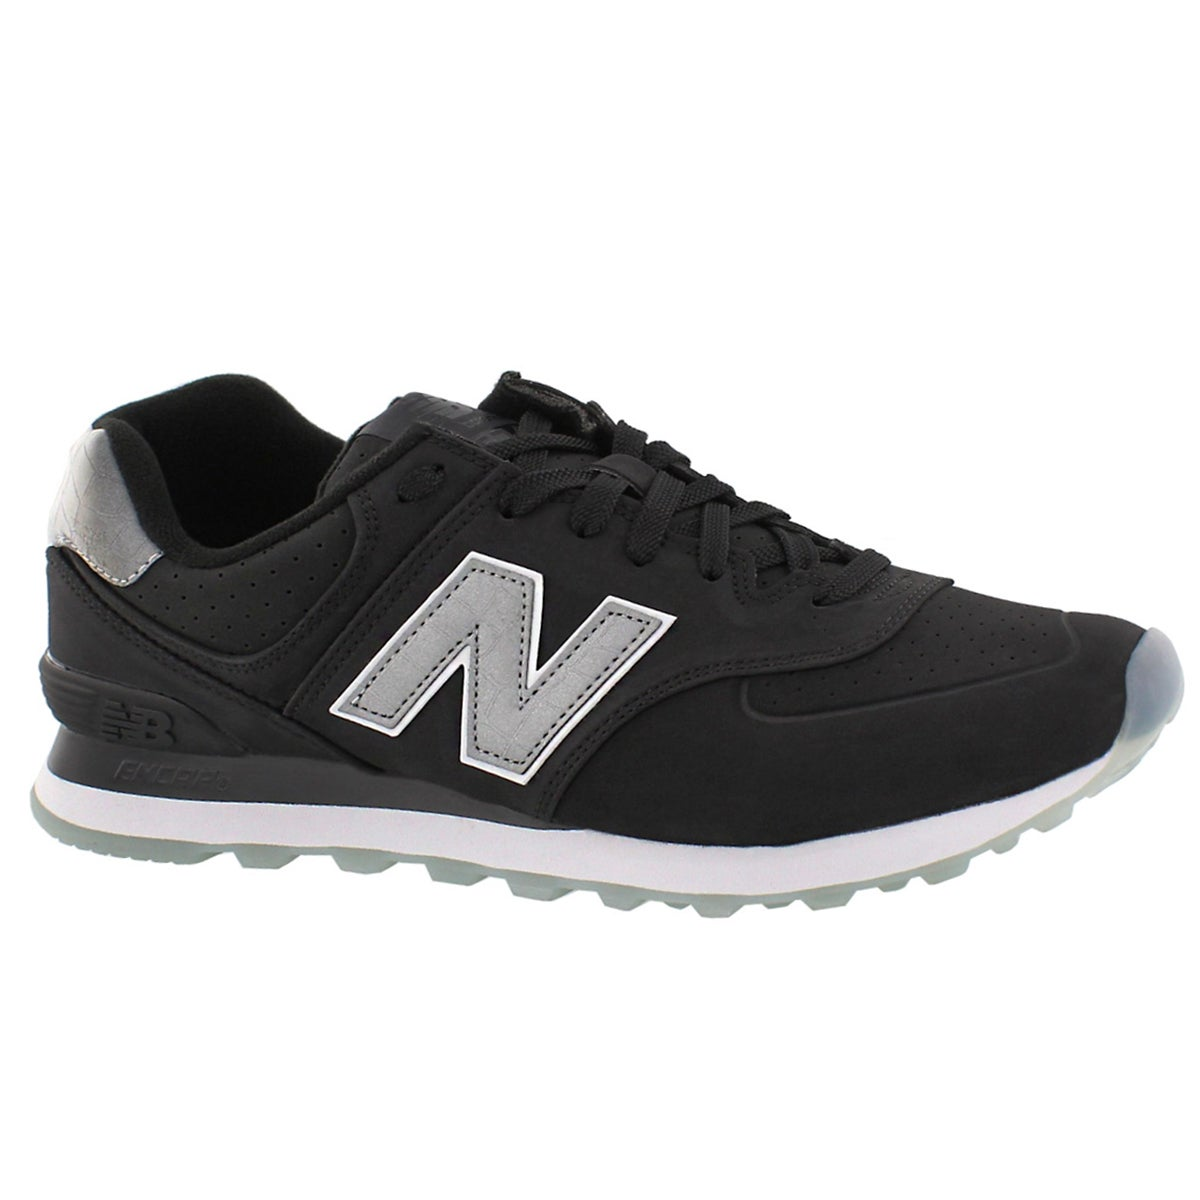 Men's 574 black lace up sneakers